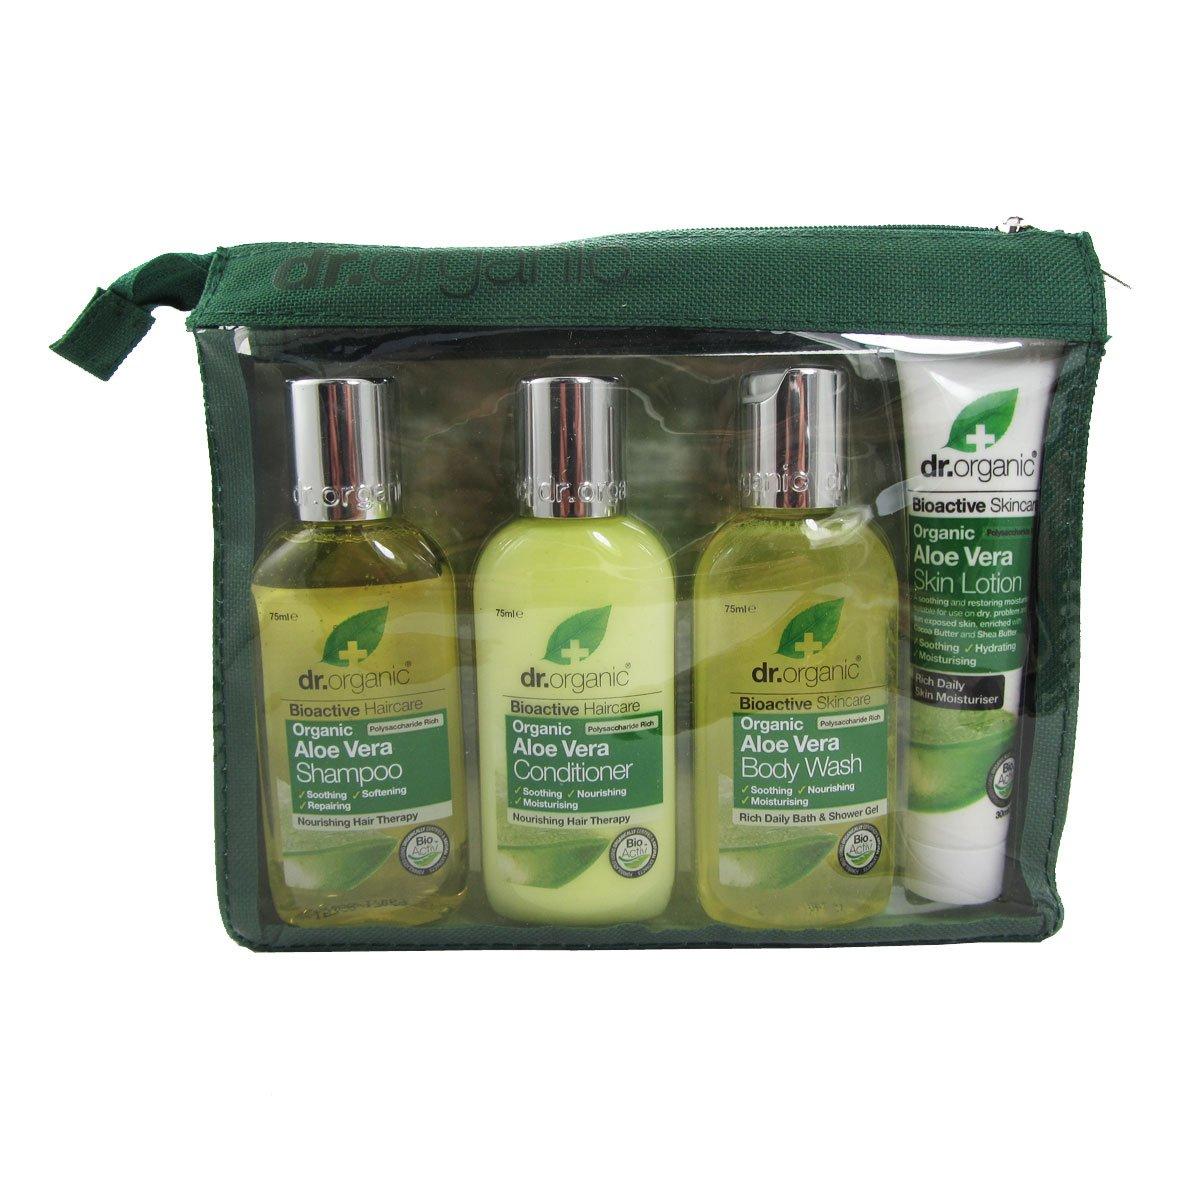 Dr Organic Aloe Vera Travel Kit